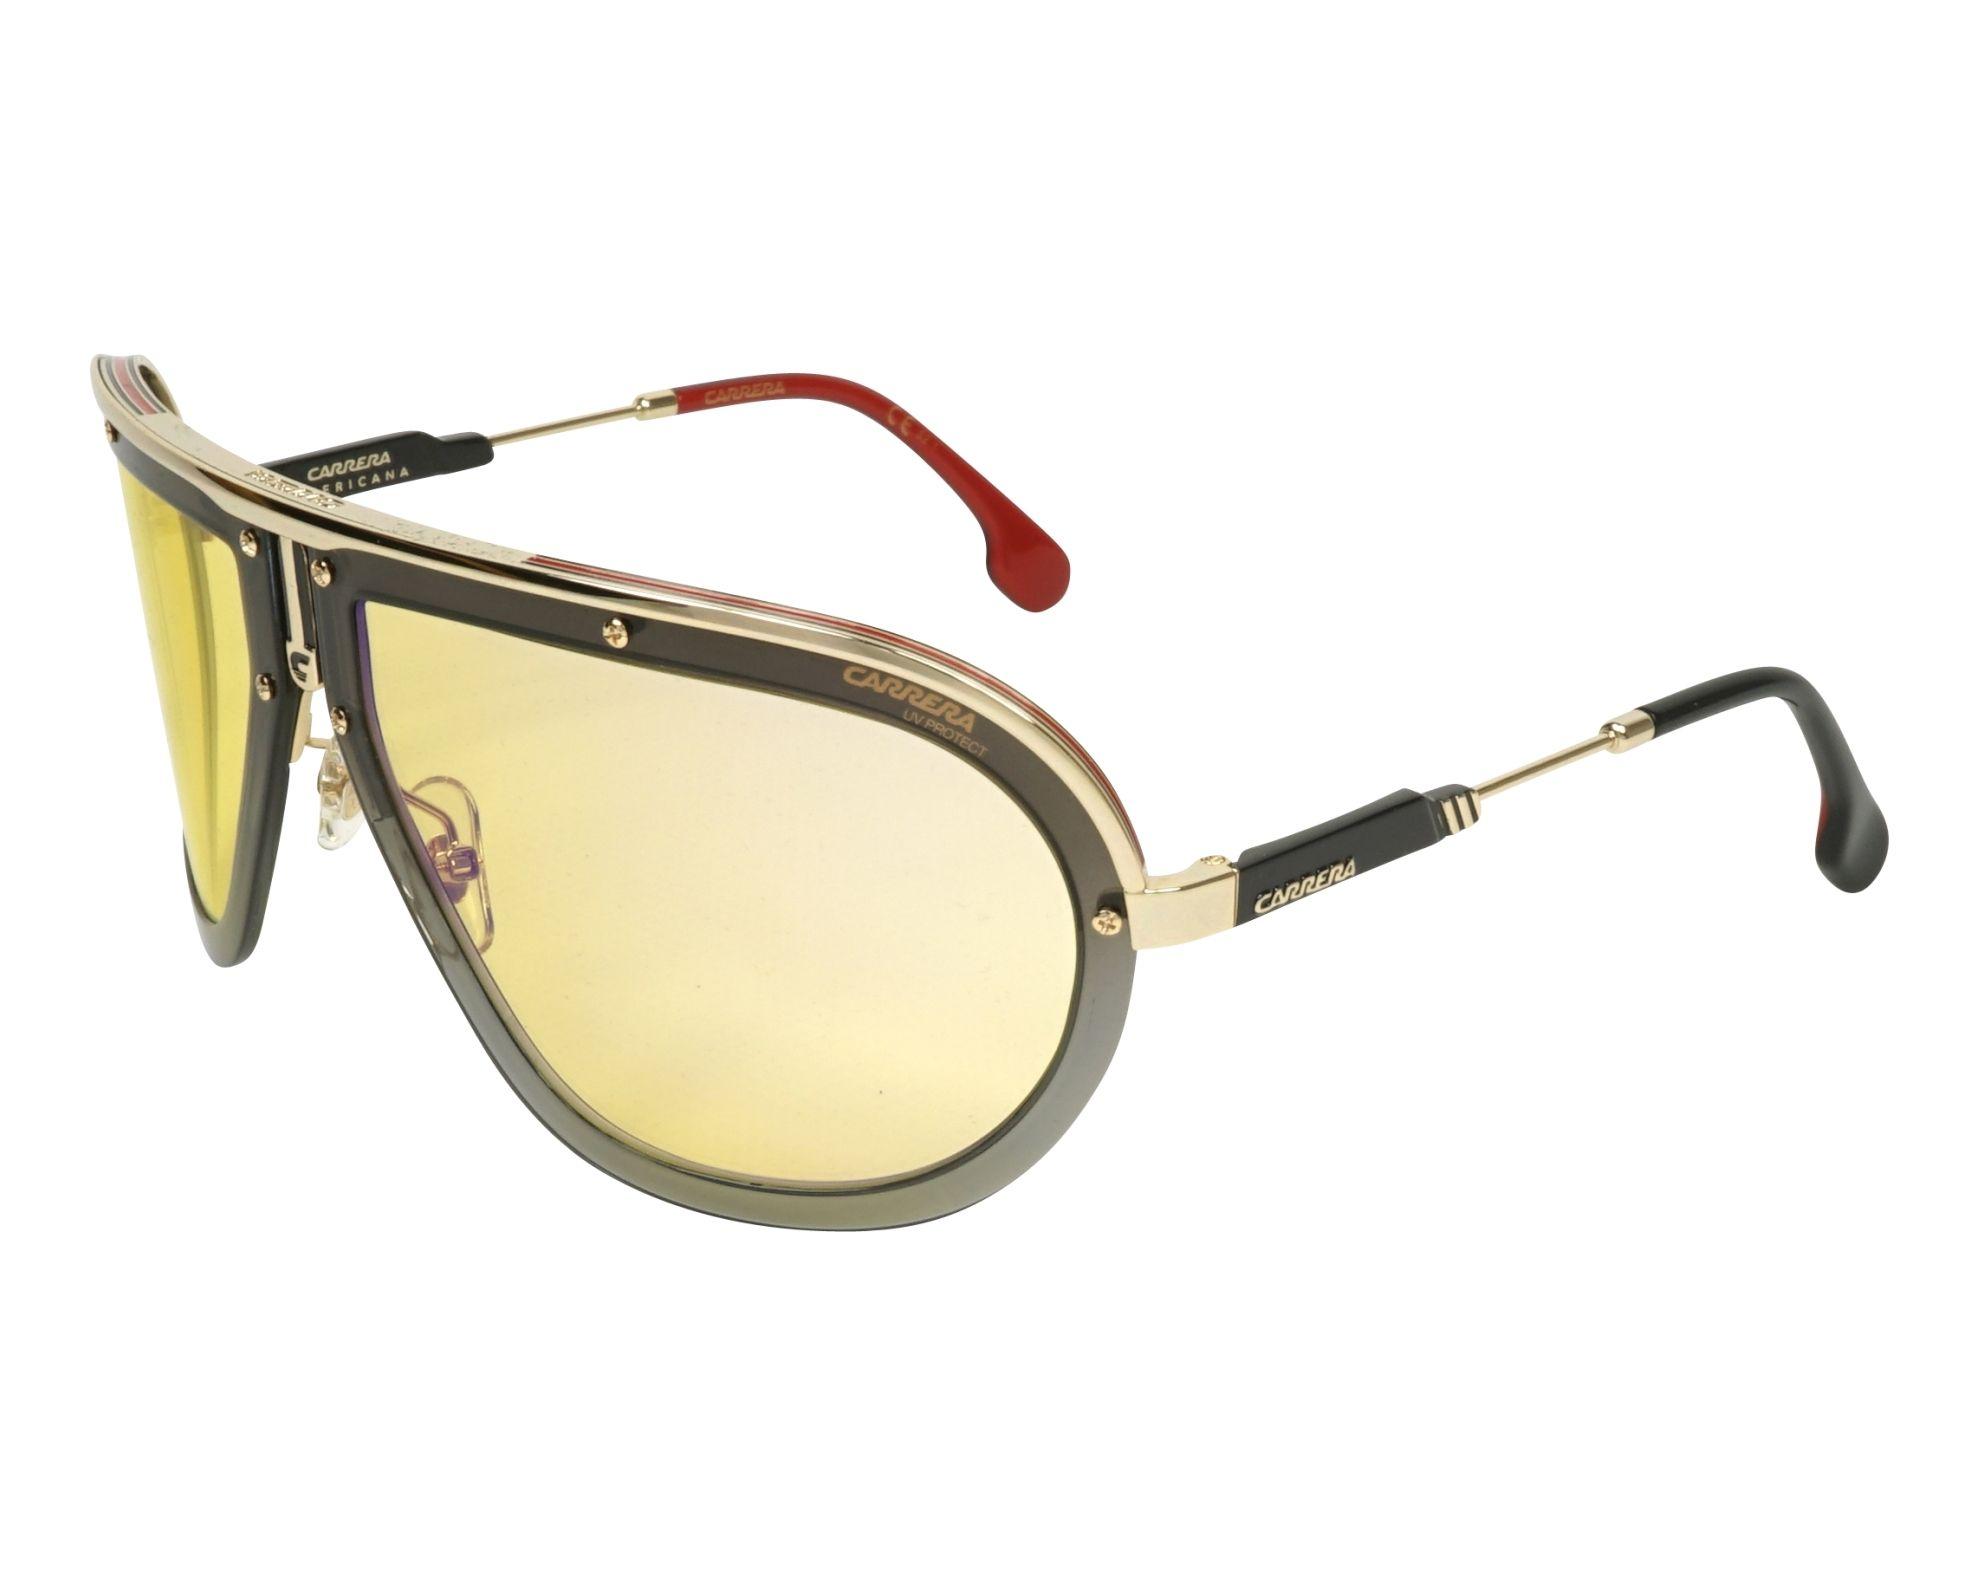 Carrera Sunglasses Gold with Yellow Lenses AMERICANA DYG/CU ...